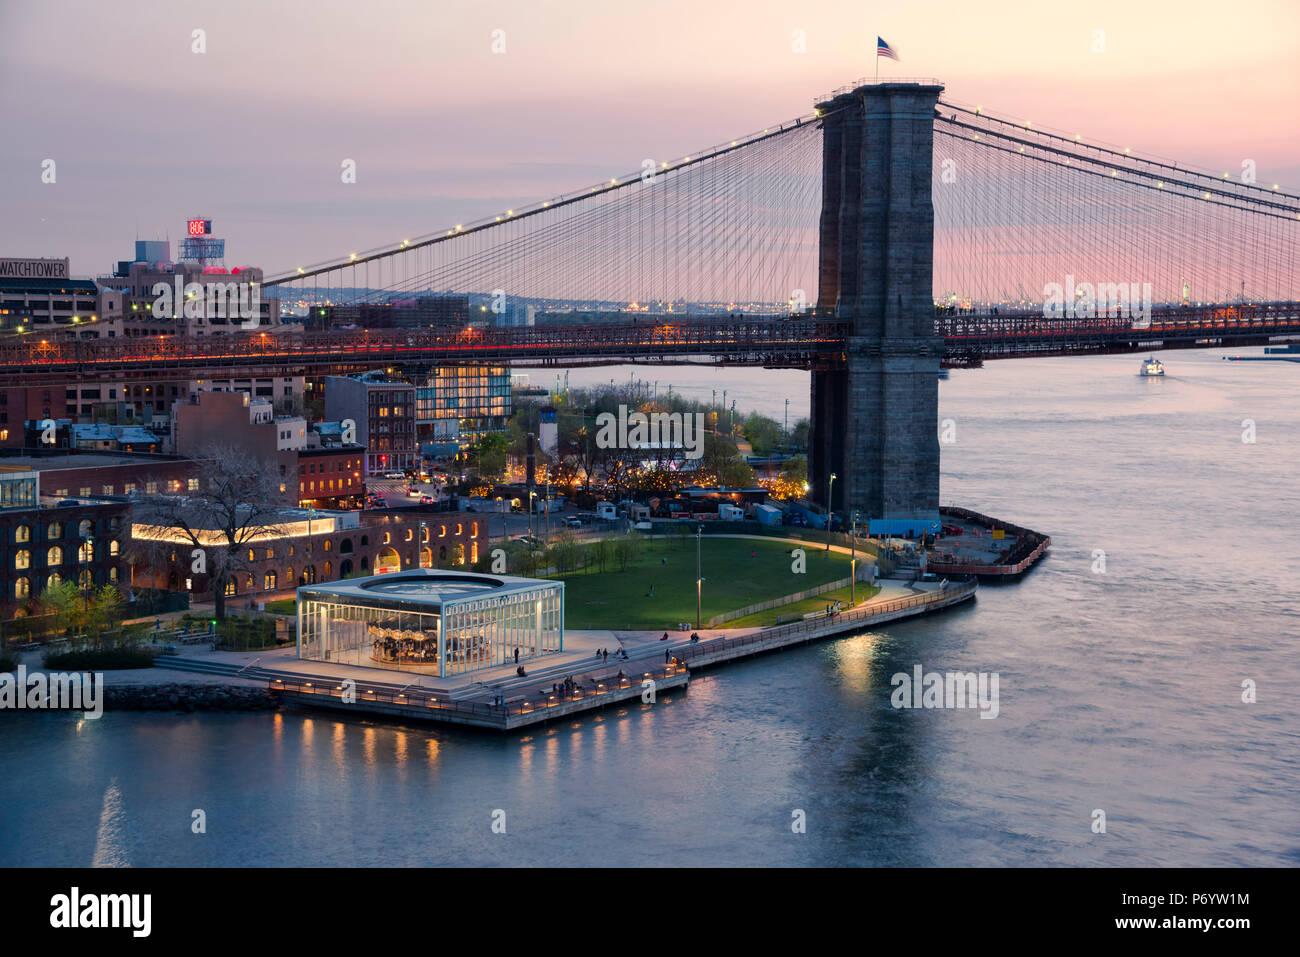 USA, New York, DUMBO, Brooklyn Bridge, East River, Brooklyn Bridge Park Stockbild